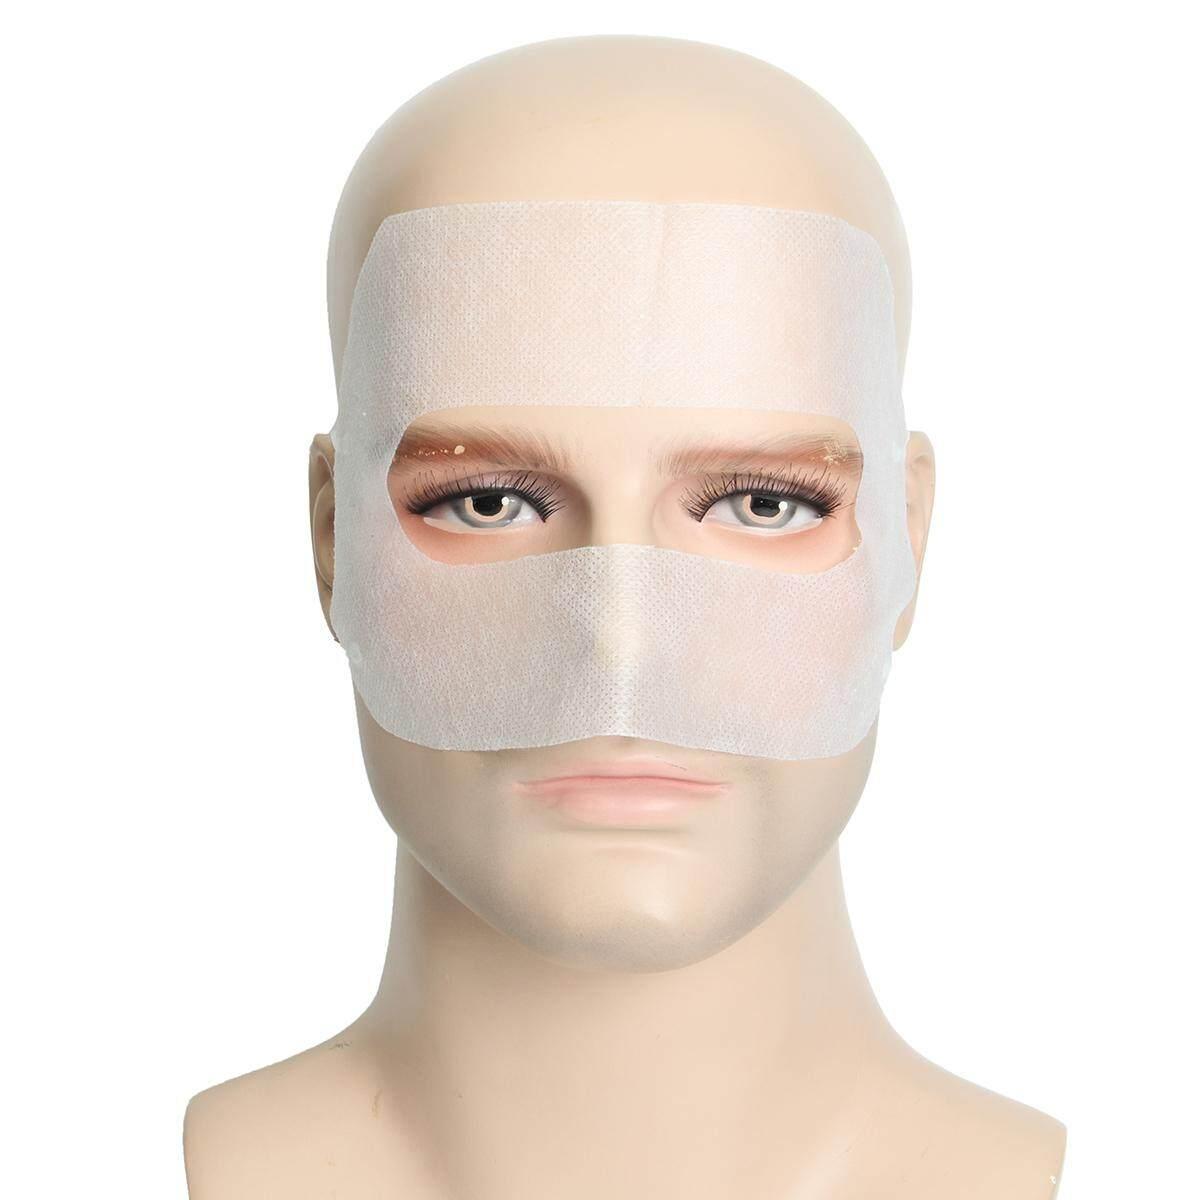 100 Pcs Protective Hygiene Eye Mask Ninja Mask For Vr Gear Vr Glasses By Glimmer.